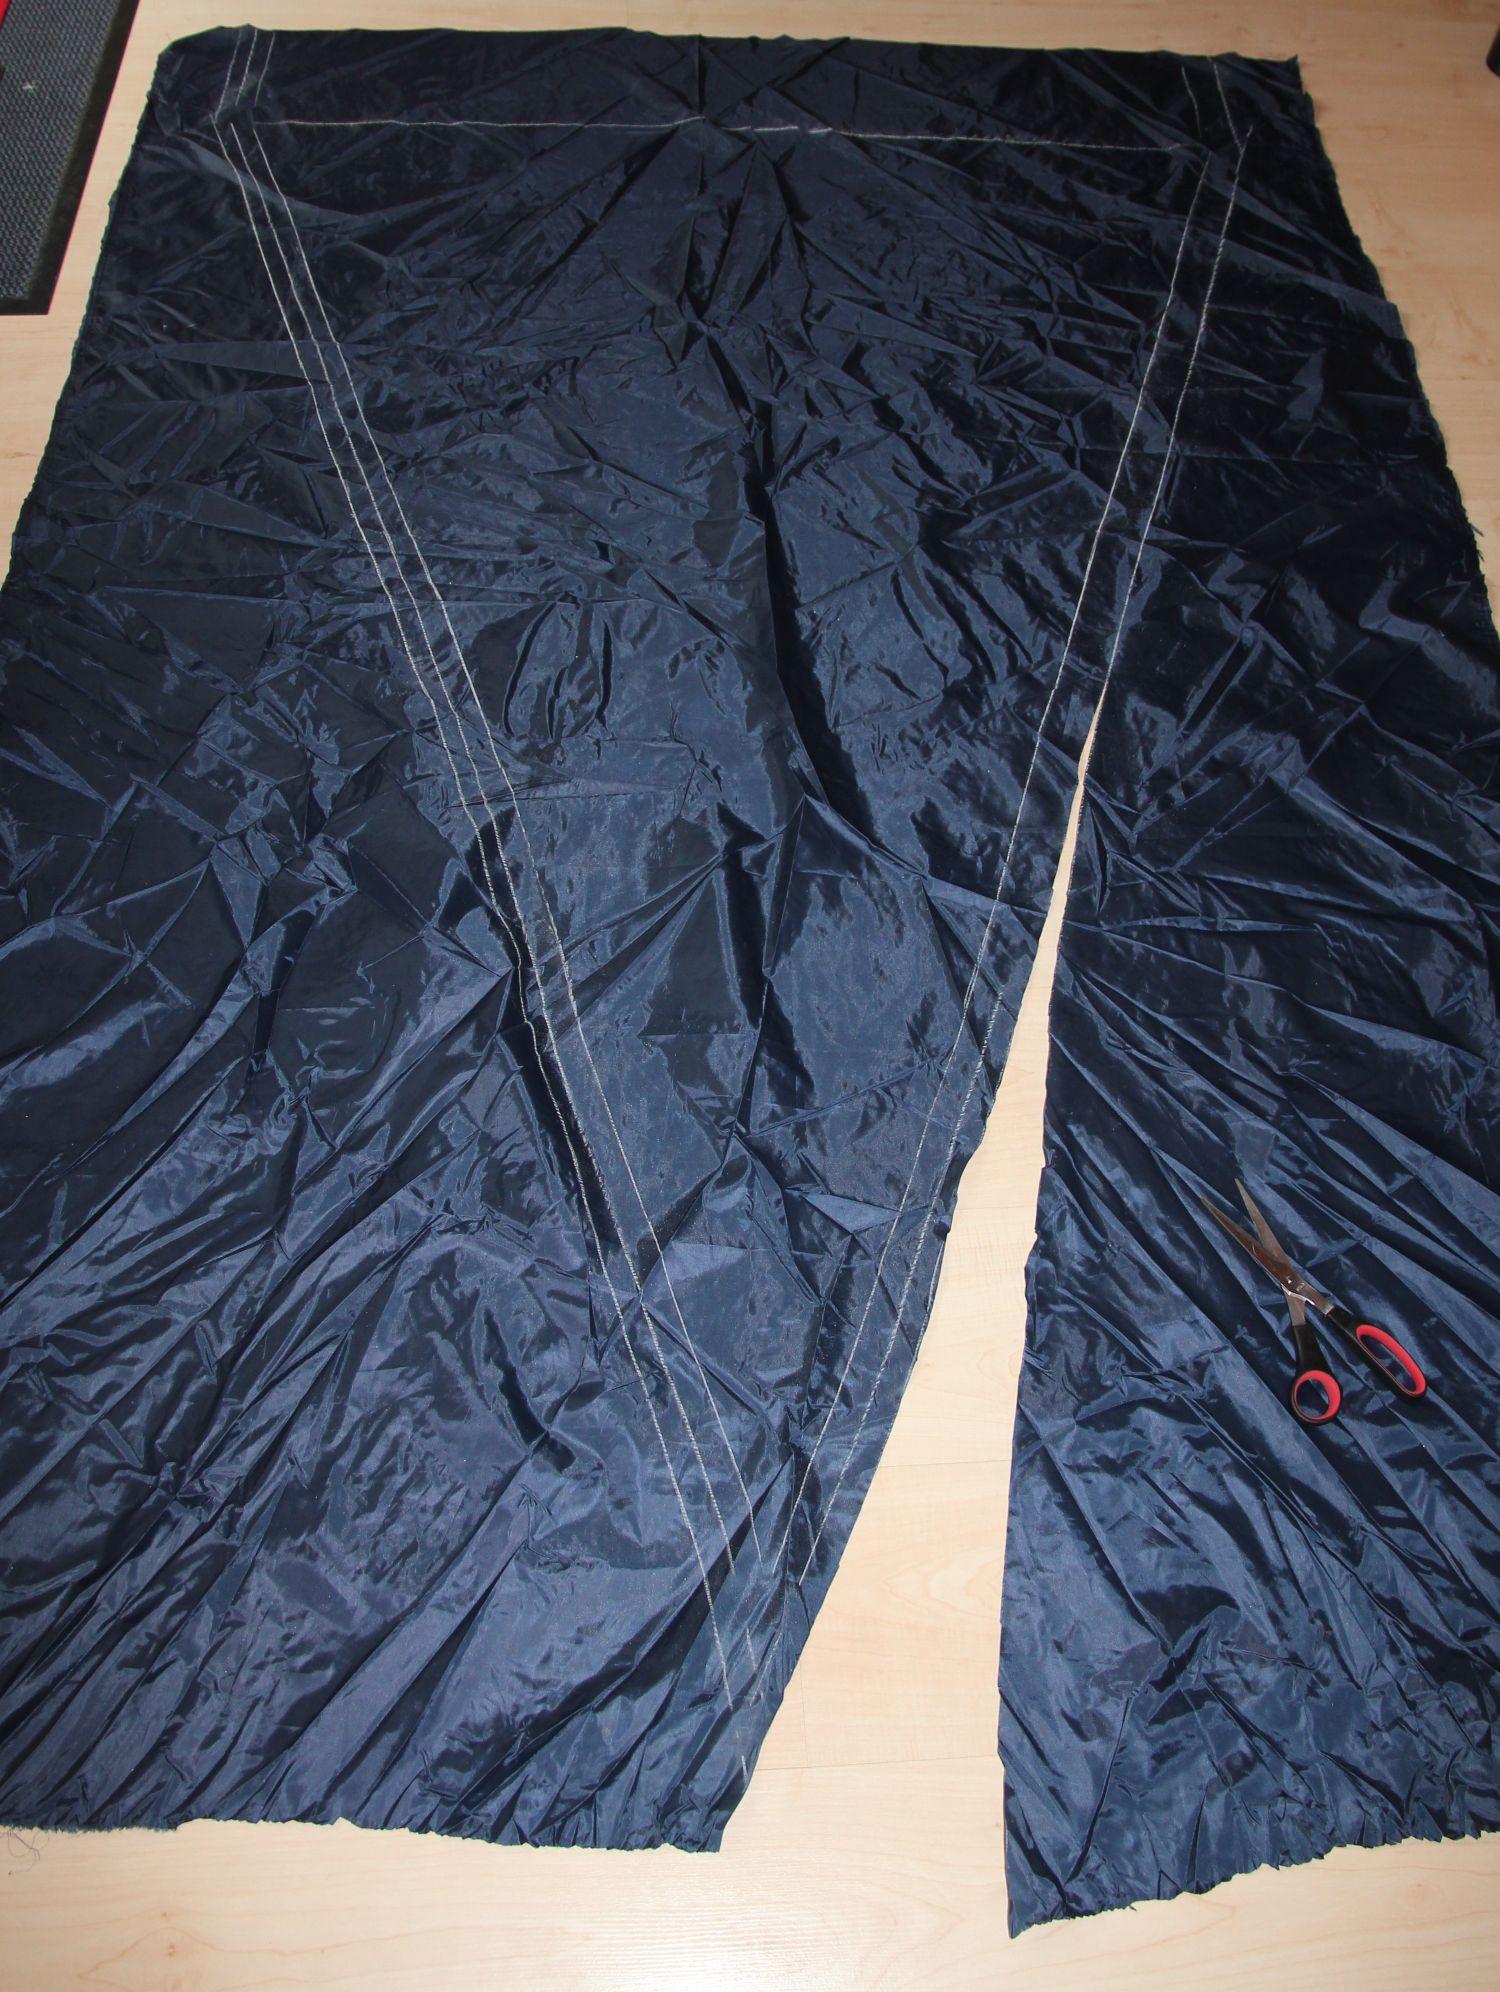 vw t5 t6 regenschutz am schiebefenster l ften auch bei regen. Black Bedroom Furniture Sets. Home Design Ideas